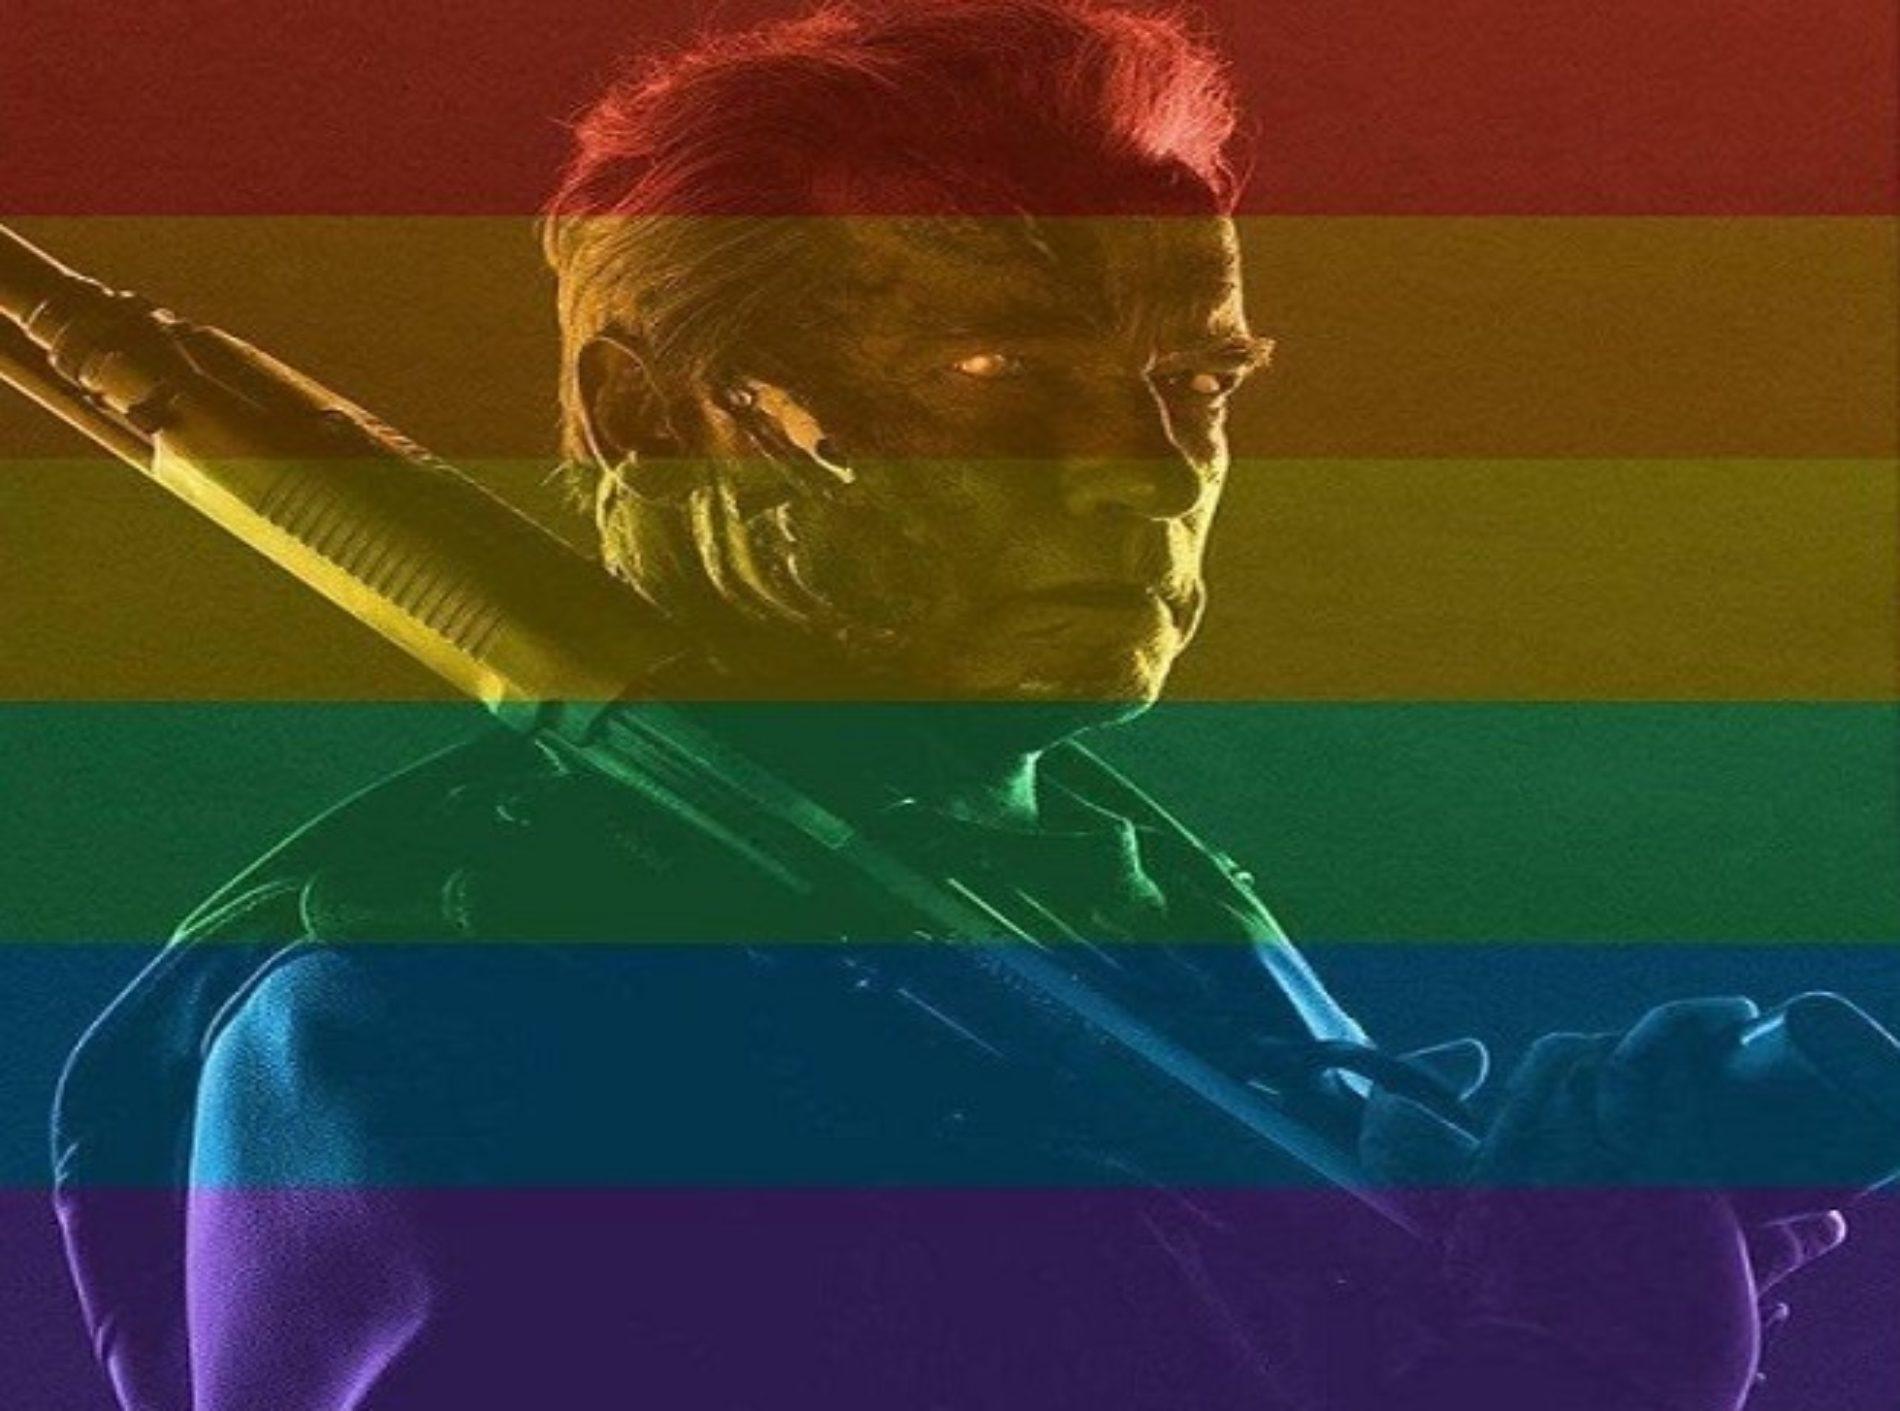 The Perfect Response Arnold Schwarzenegger Gave A Homophobic Troll